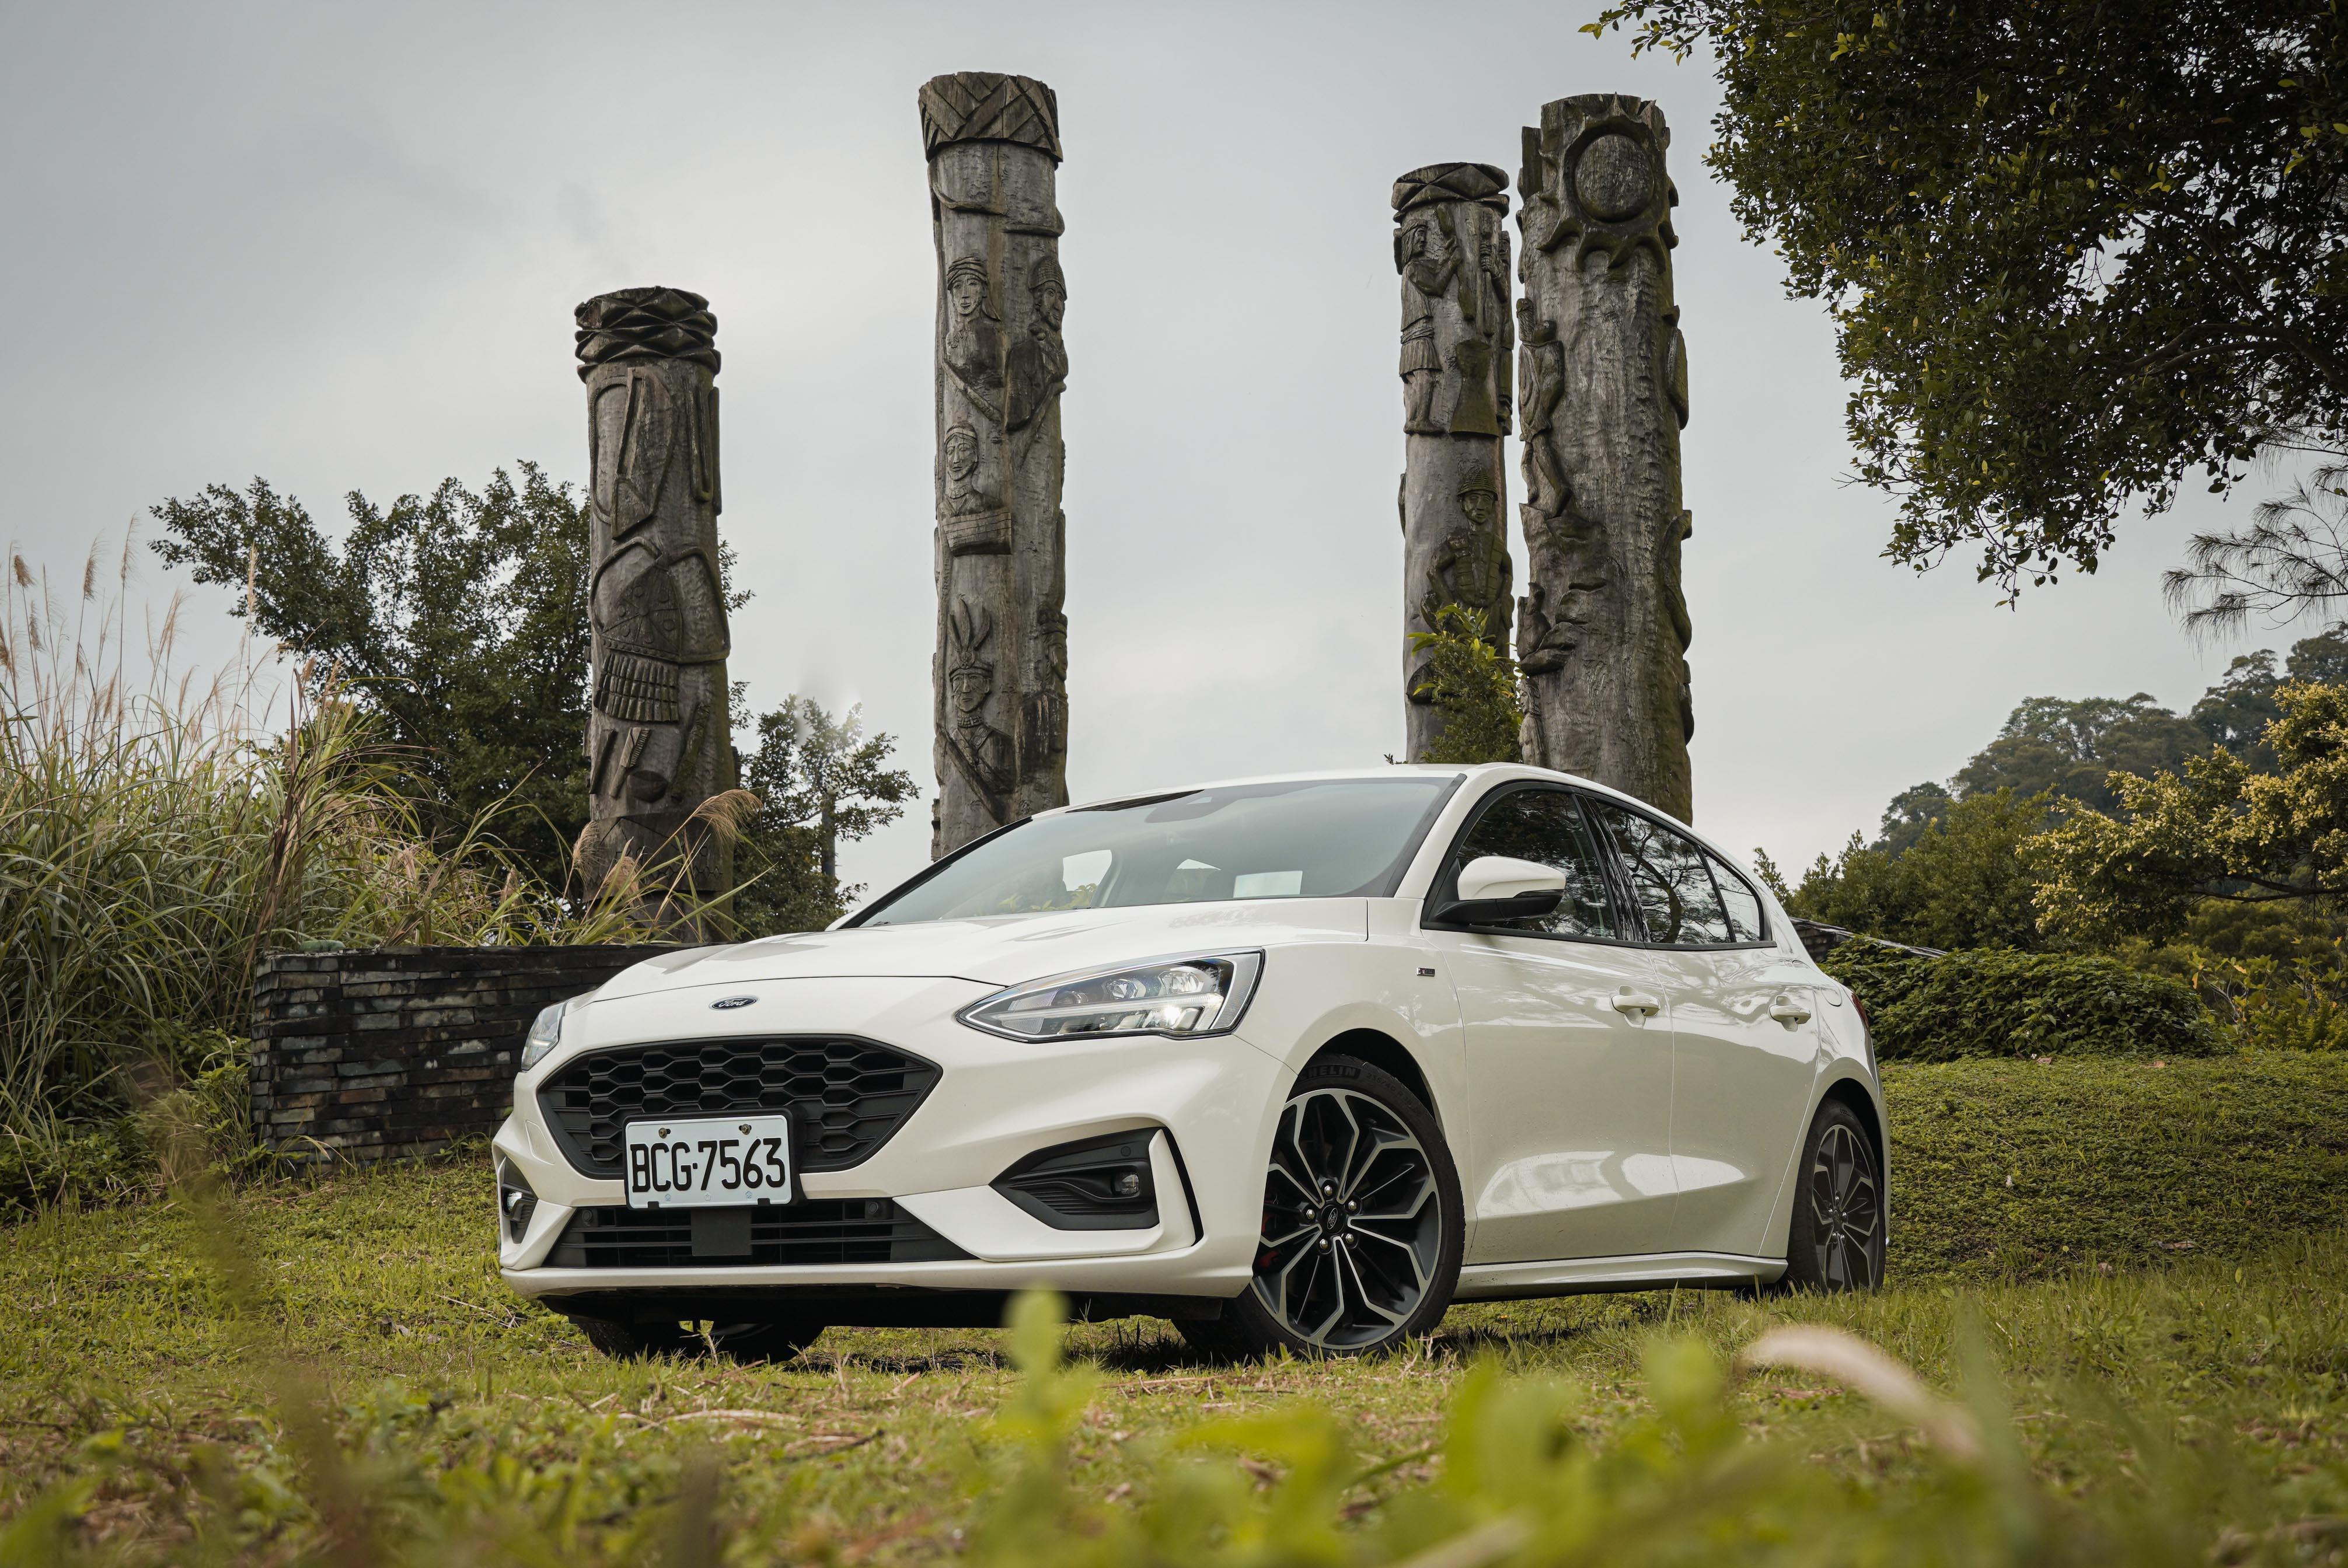 Ford Focus ST-Line Lommel 售價新台幣 92.8 萬元,舊換新價 87.8 萬。